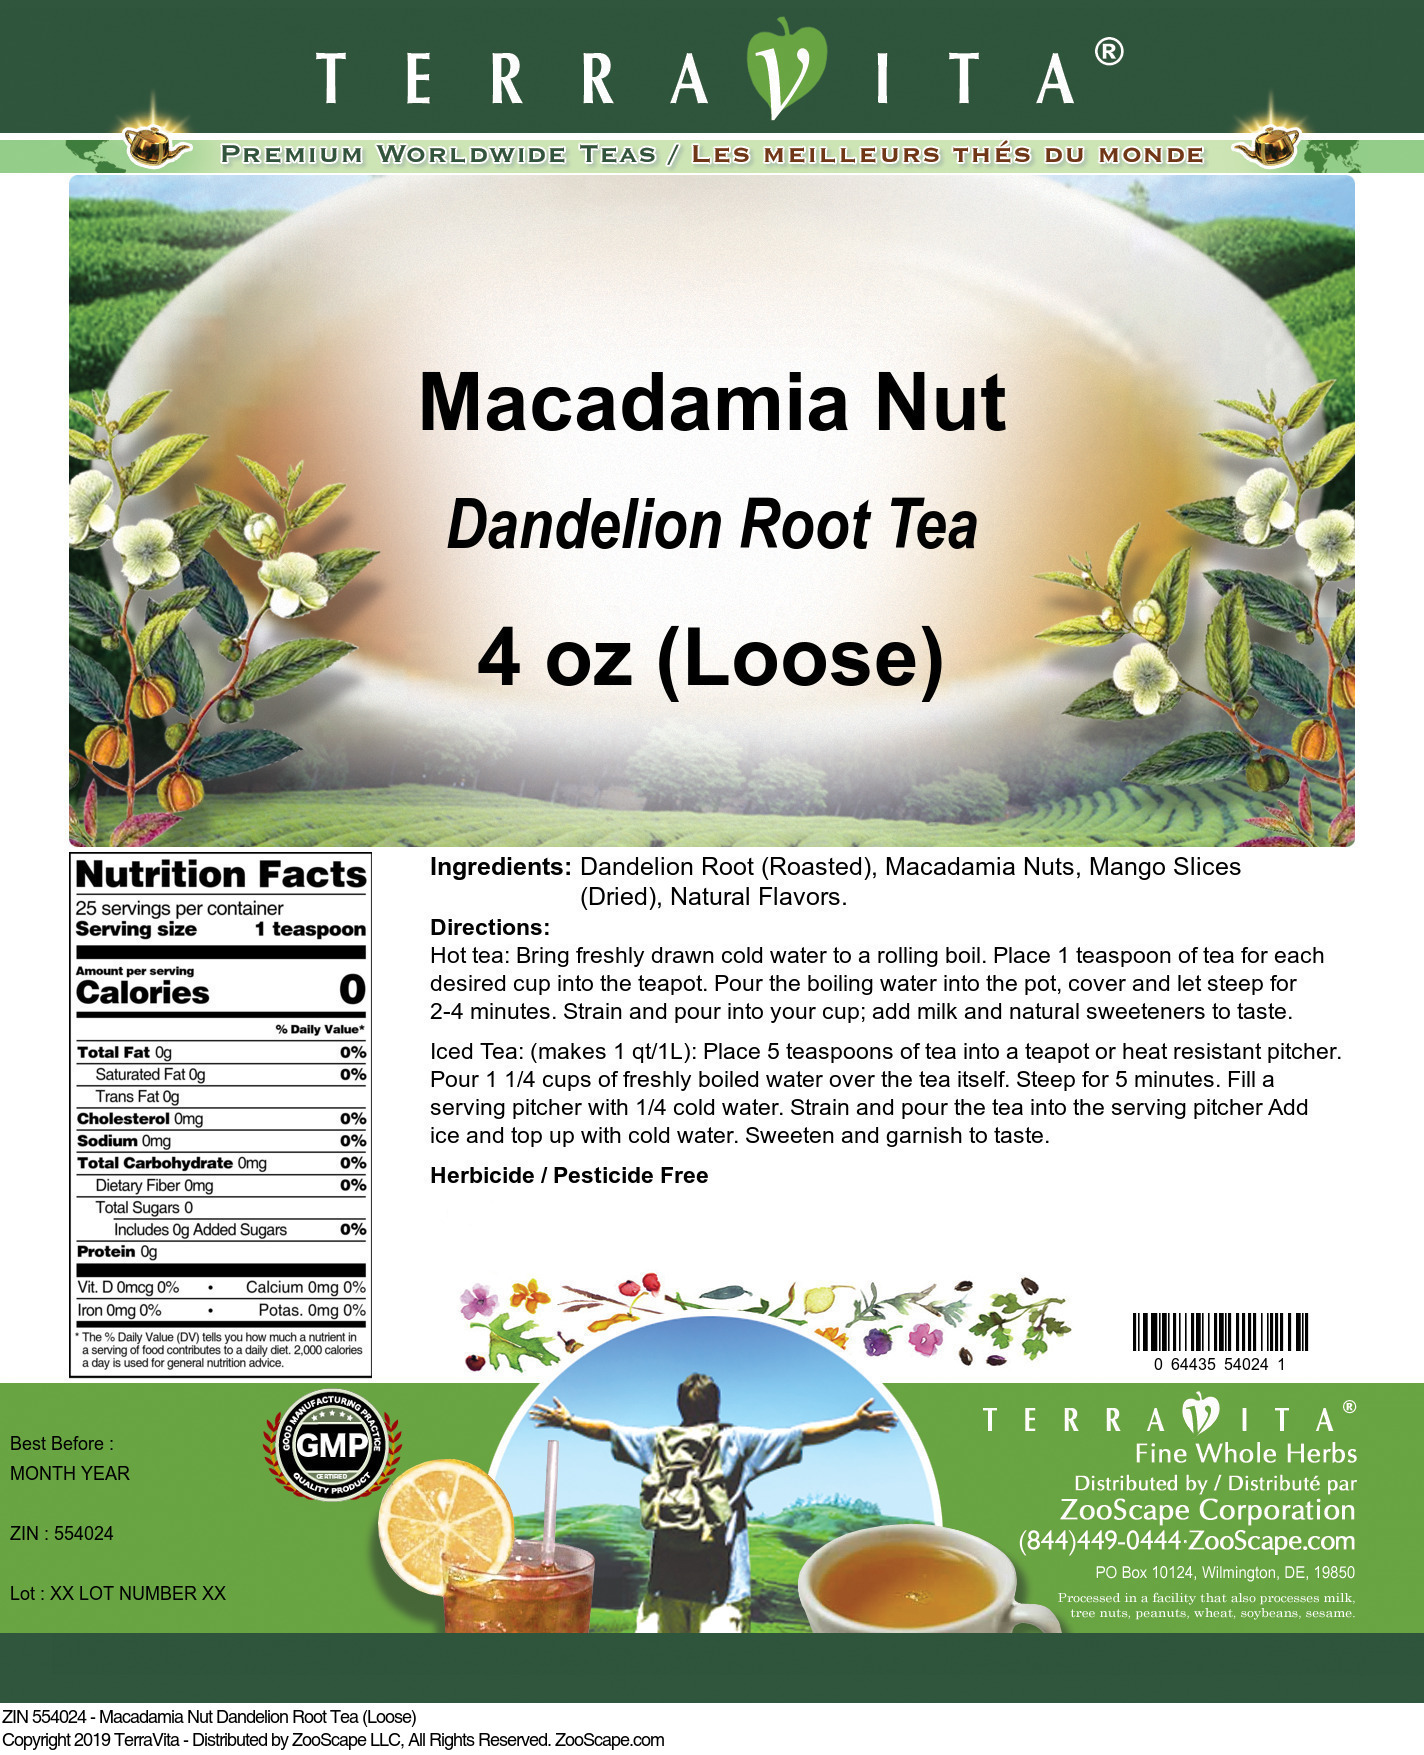 Macadamia Nut Dandelion Root